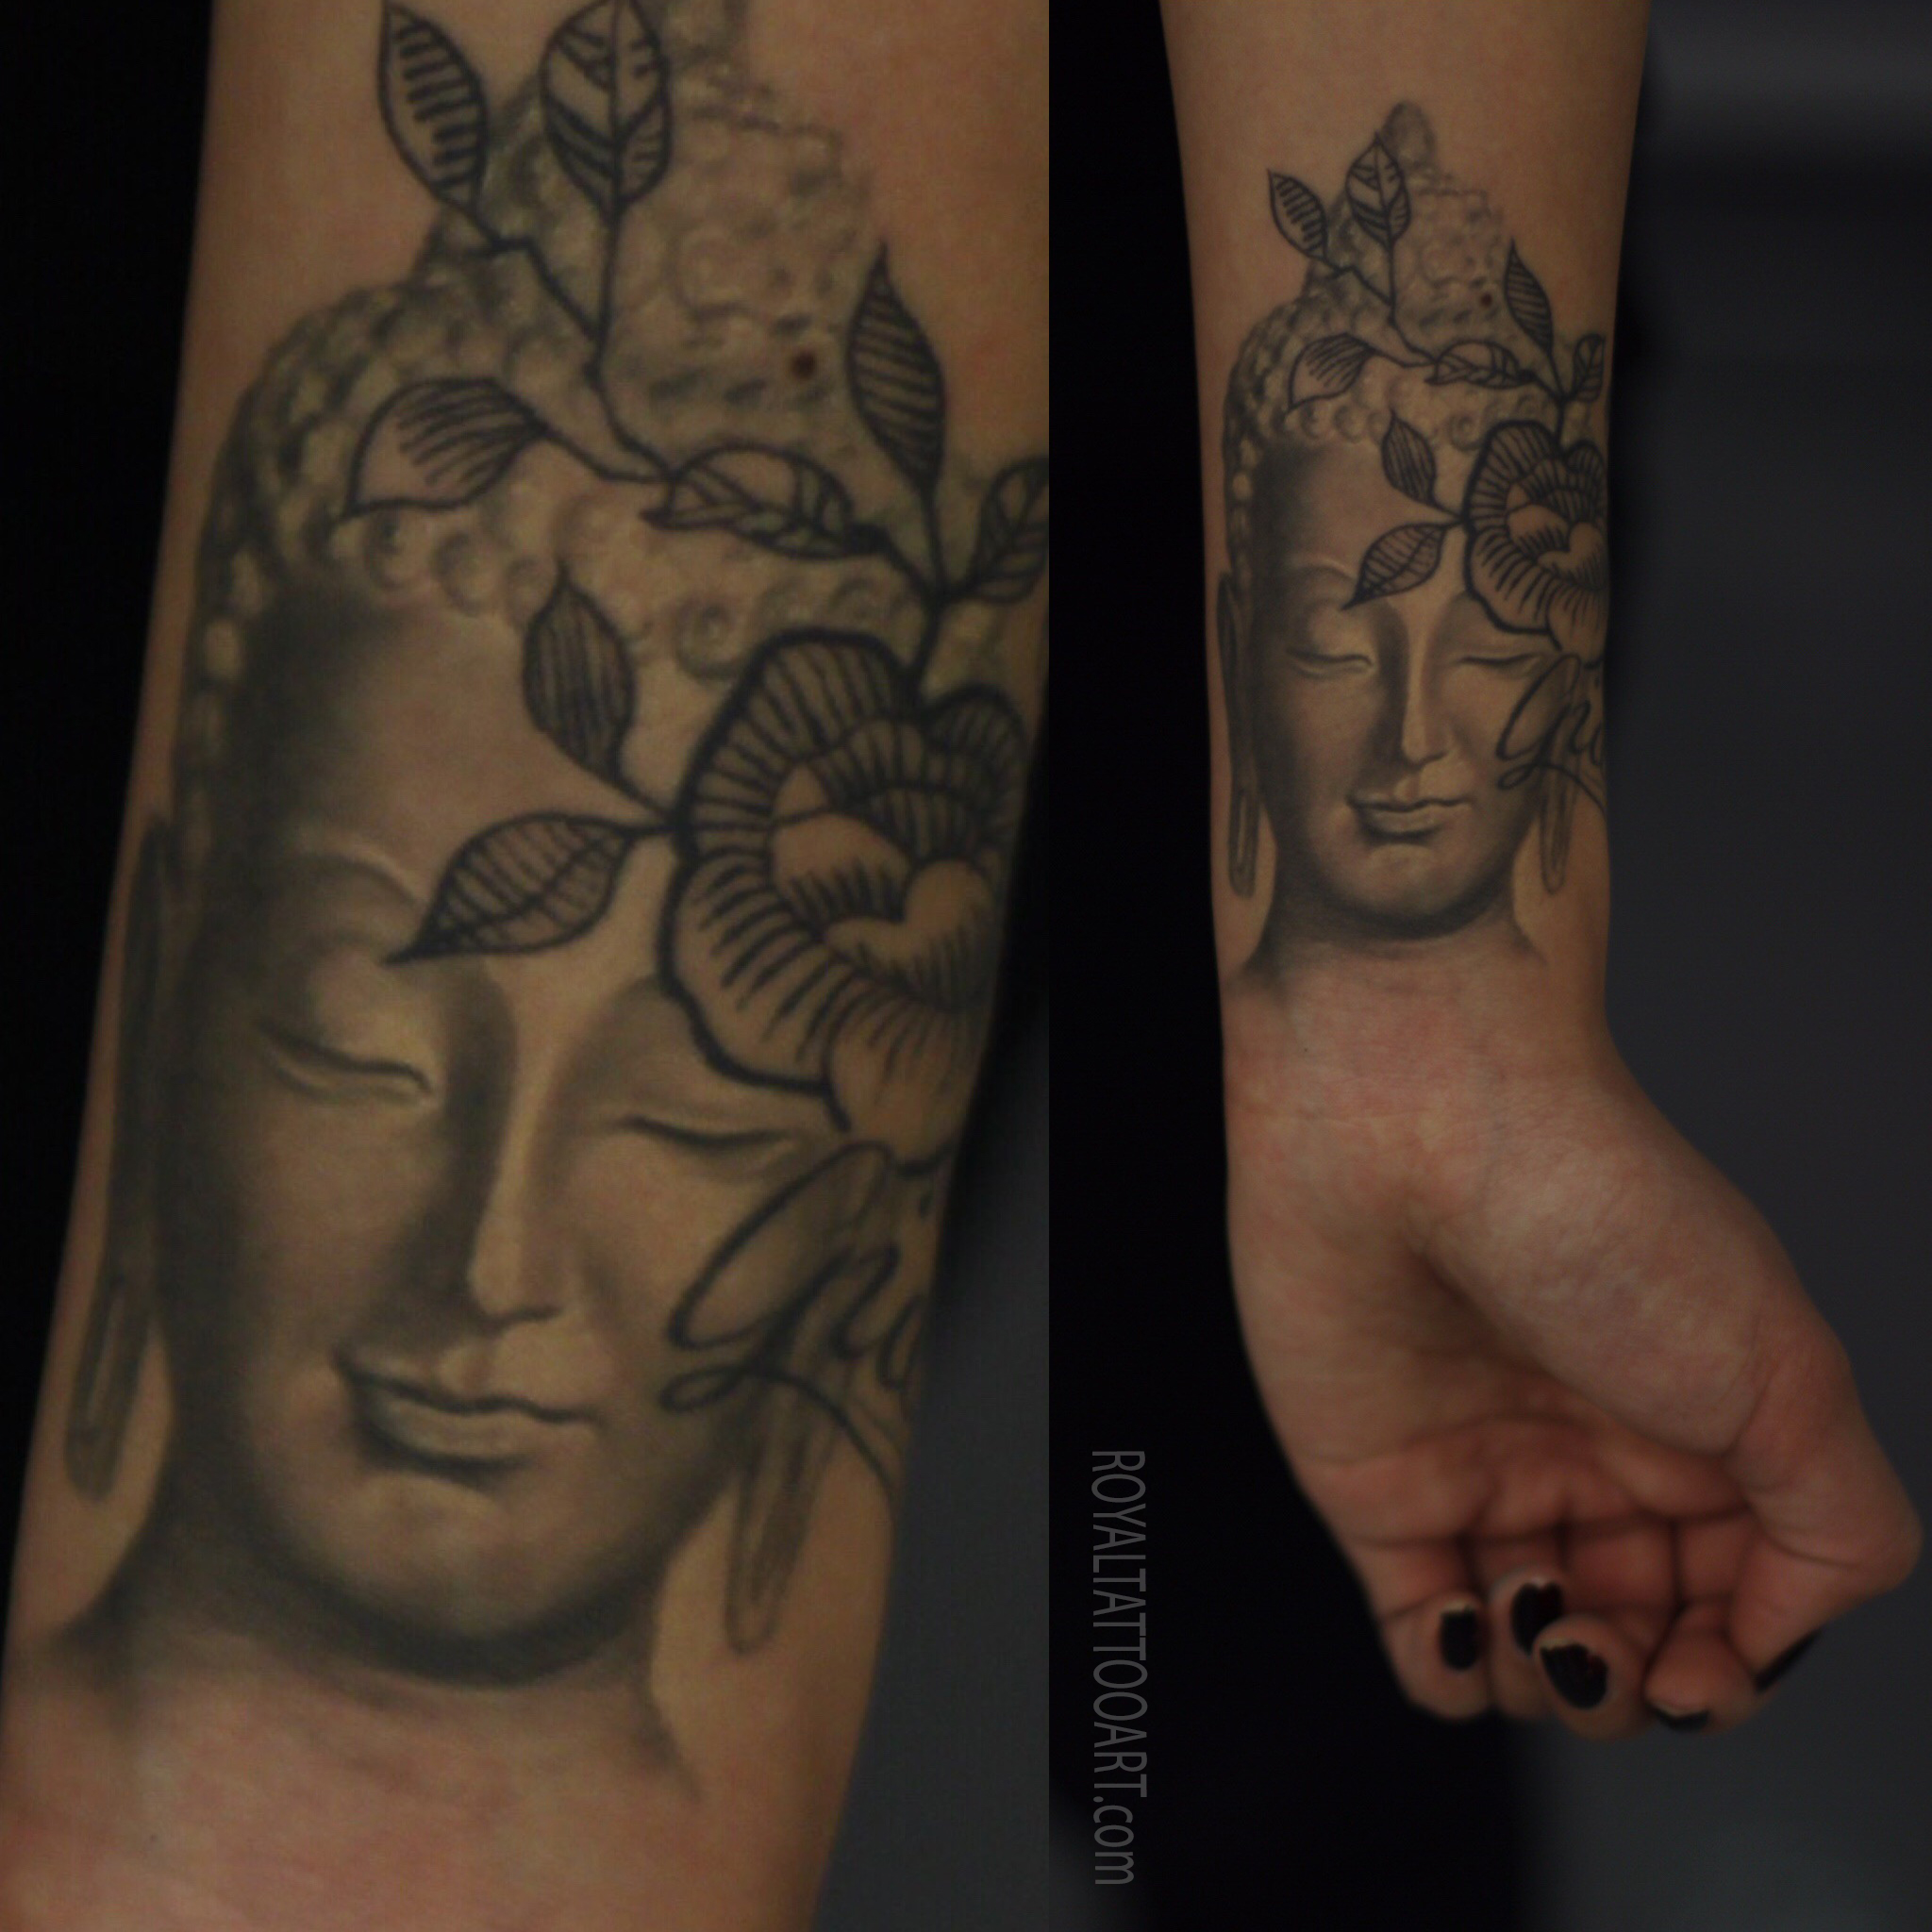 budha tattoo black and realism art artist nyc new york  copy.jpg